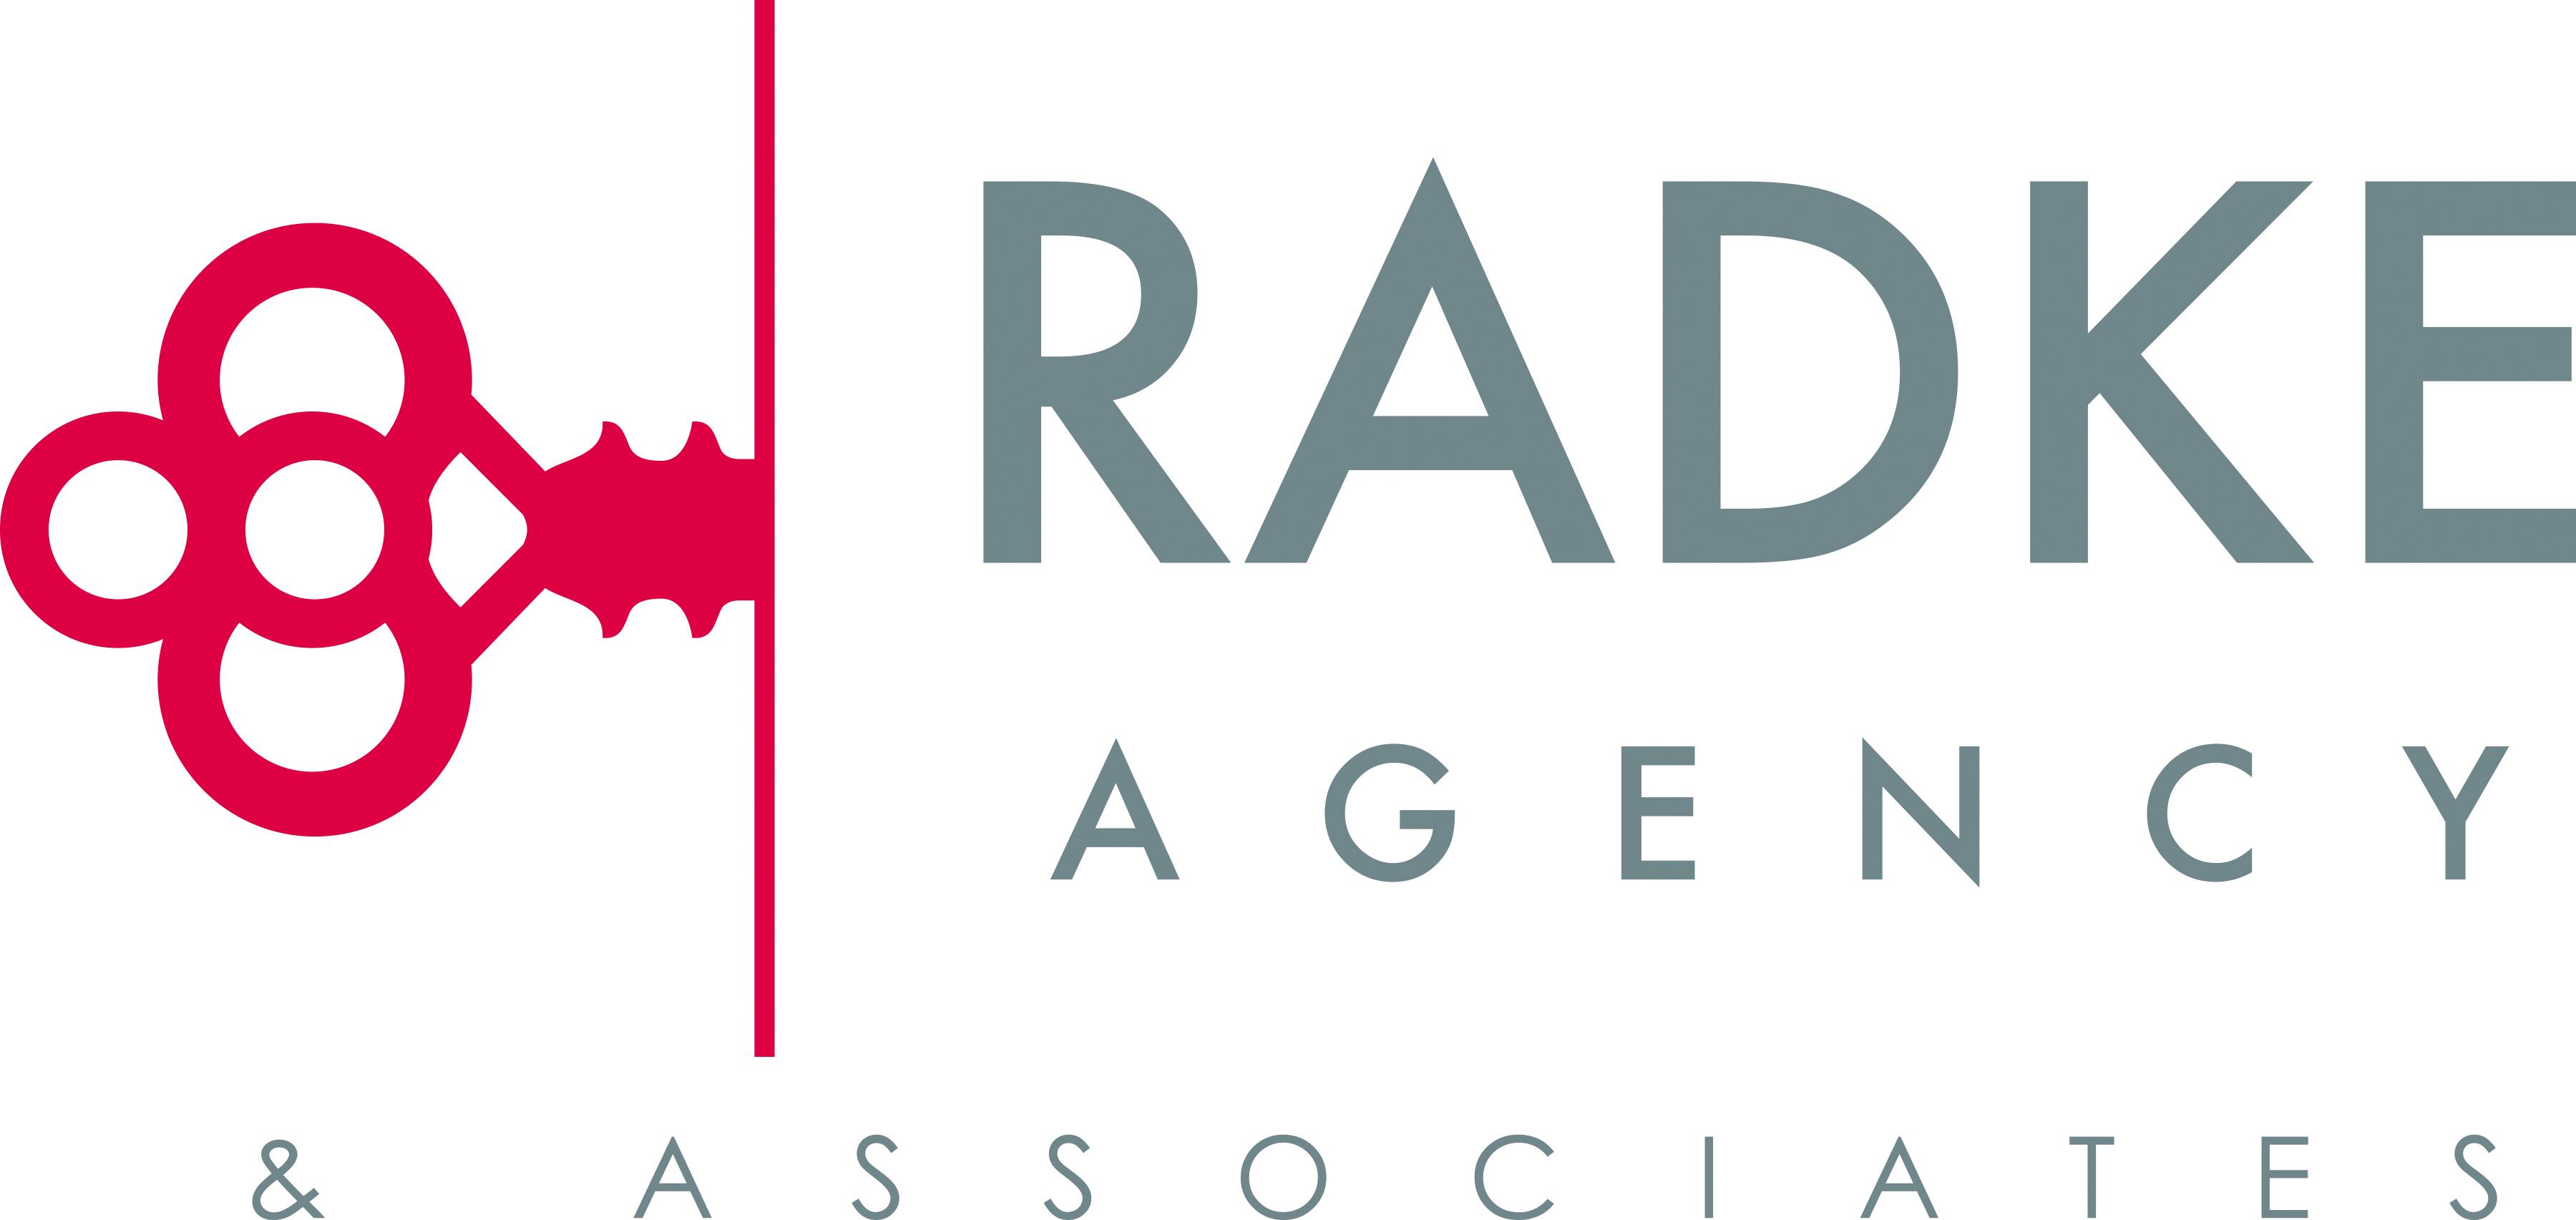 Radke Agency & Associates